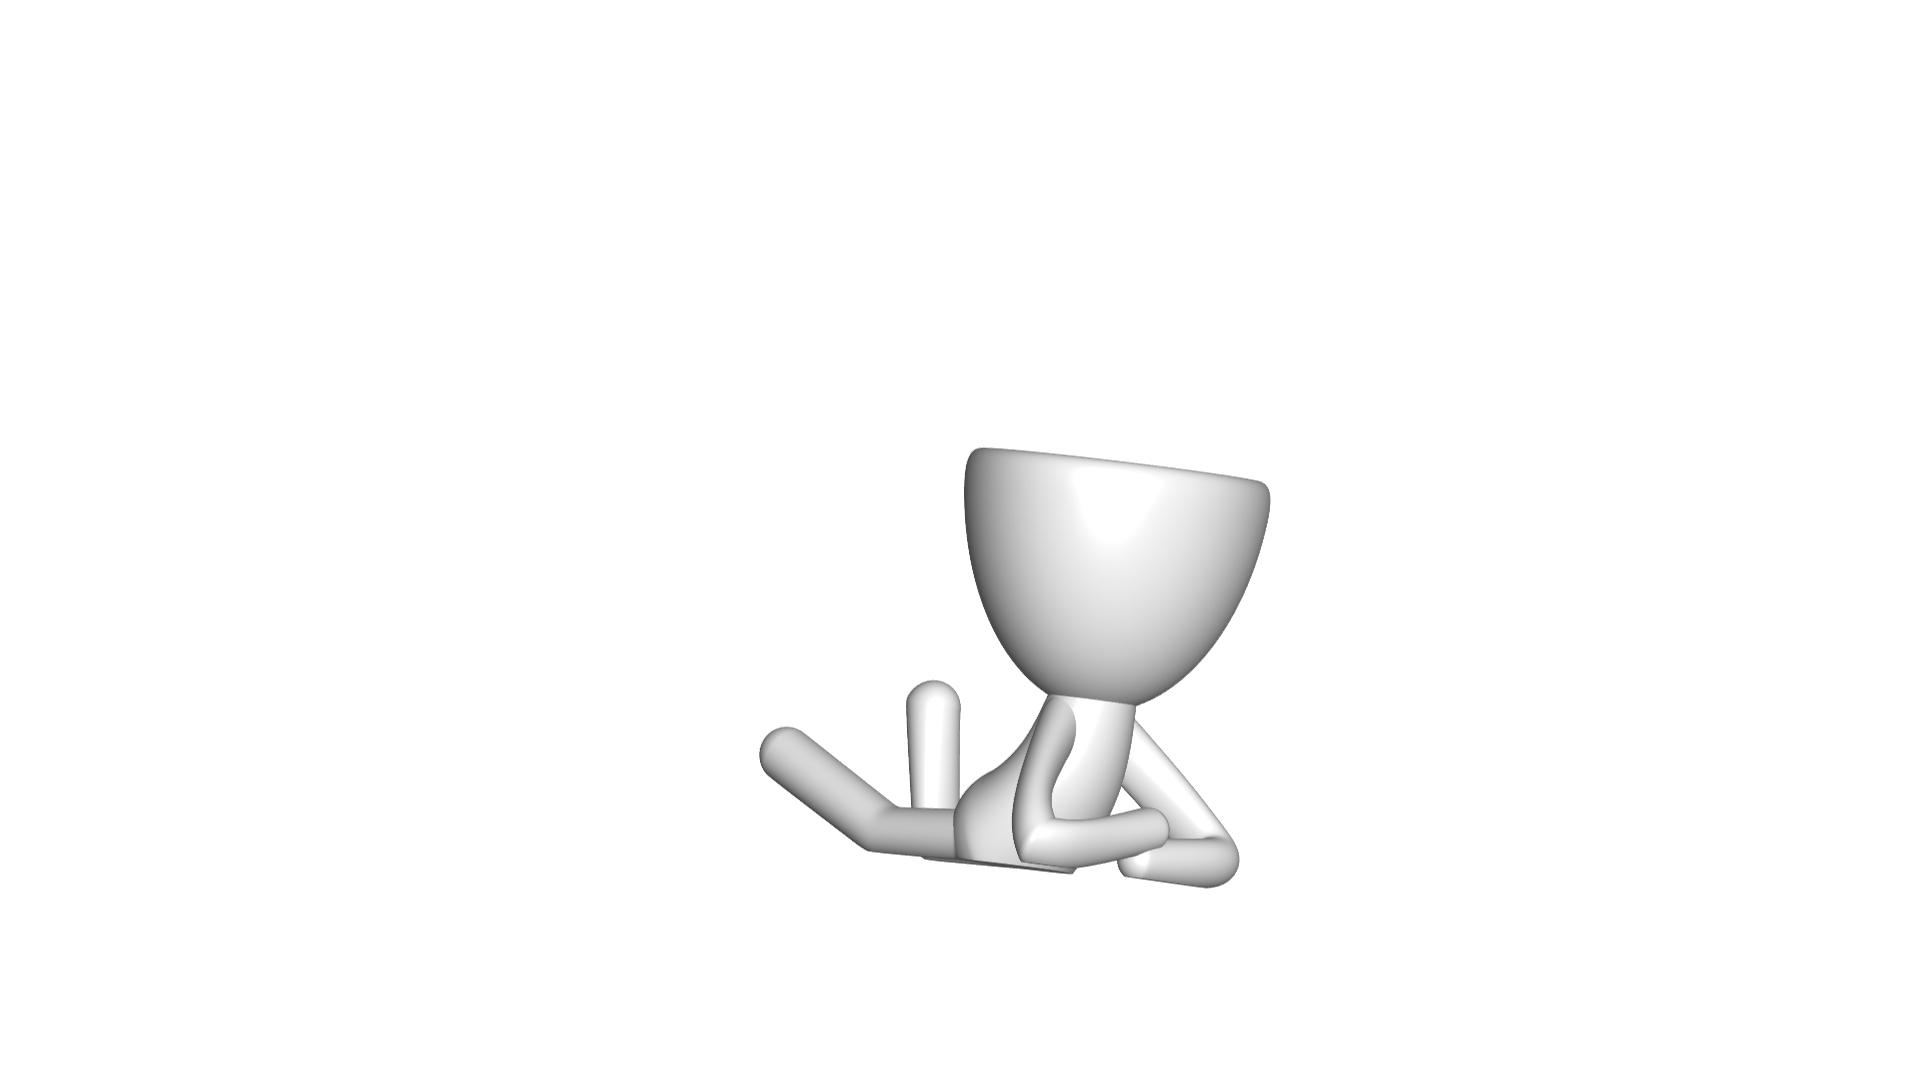 Vaso_02_Blanco_1.jpg Download free STL file JARRÓN MACETA ROBERT 02 - VASE FLOWERPOT ROBERT 02 • 3D print model, PRODUSTL56